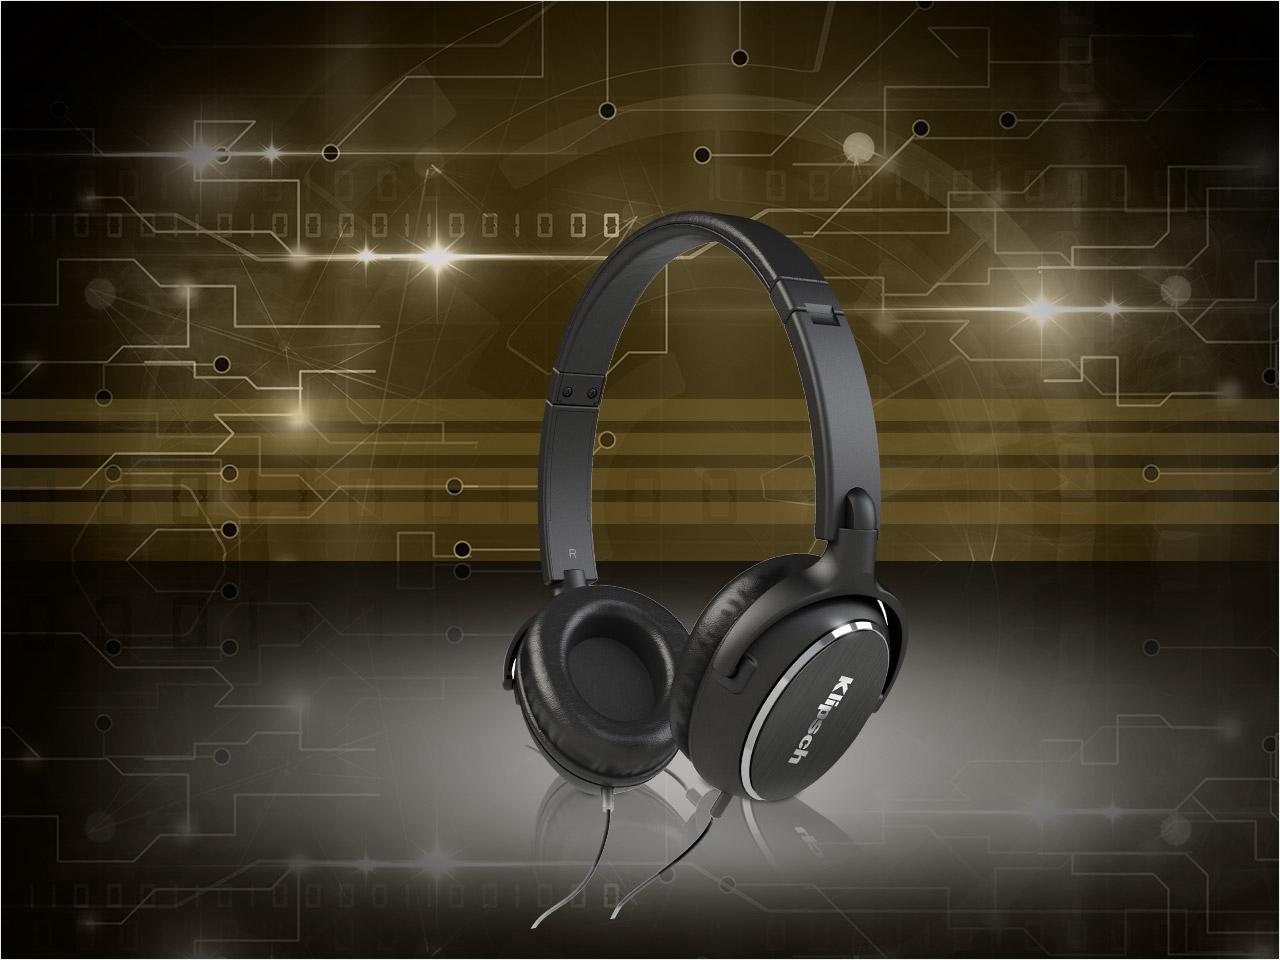 Klipsch Reference R6 On-Ear Headphones (Black) $26; Bluedio T3 Plus Bluetooth Headphones $36